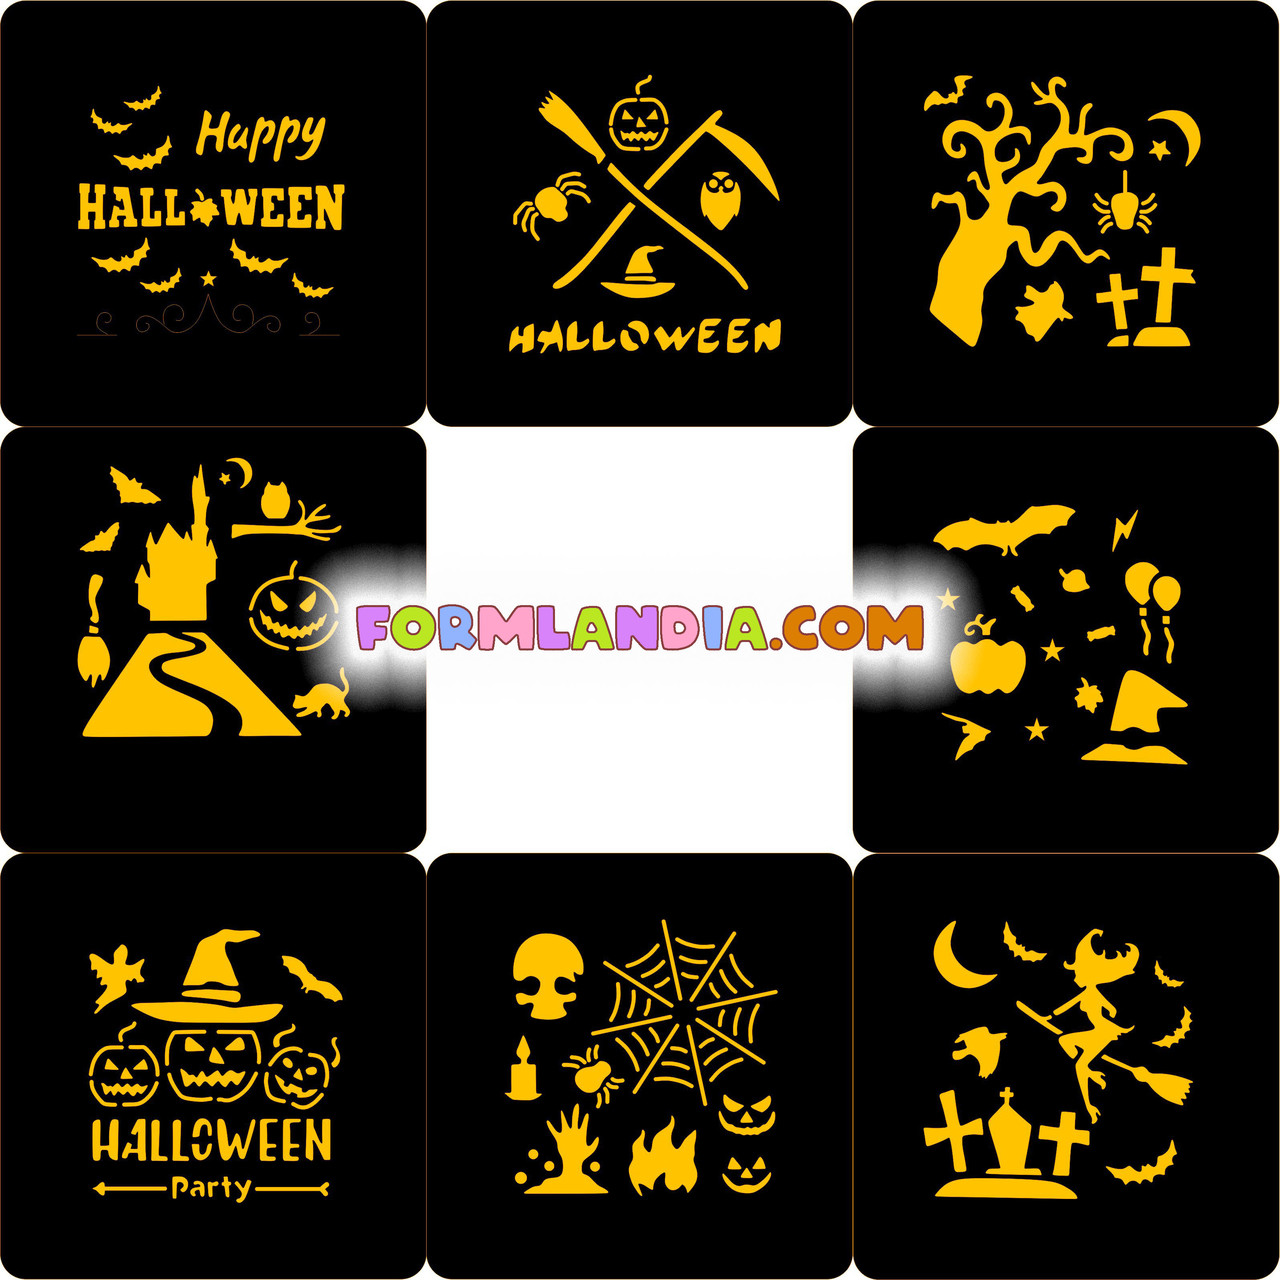 Набор Трафаретов для пряников Хэллоуин №16